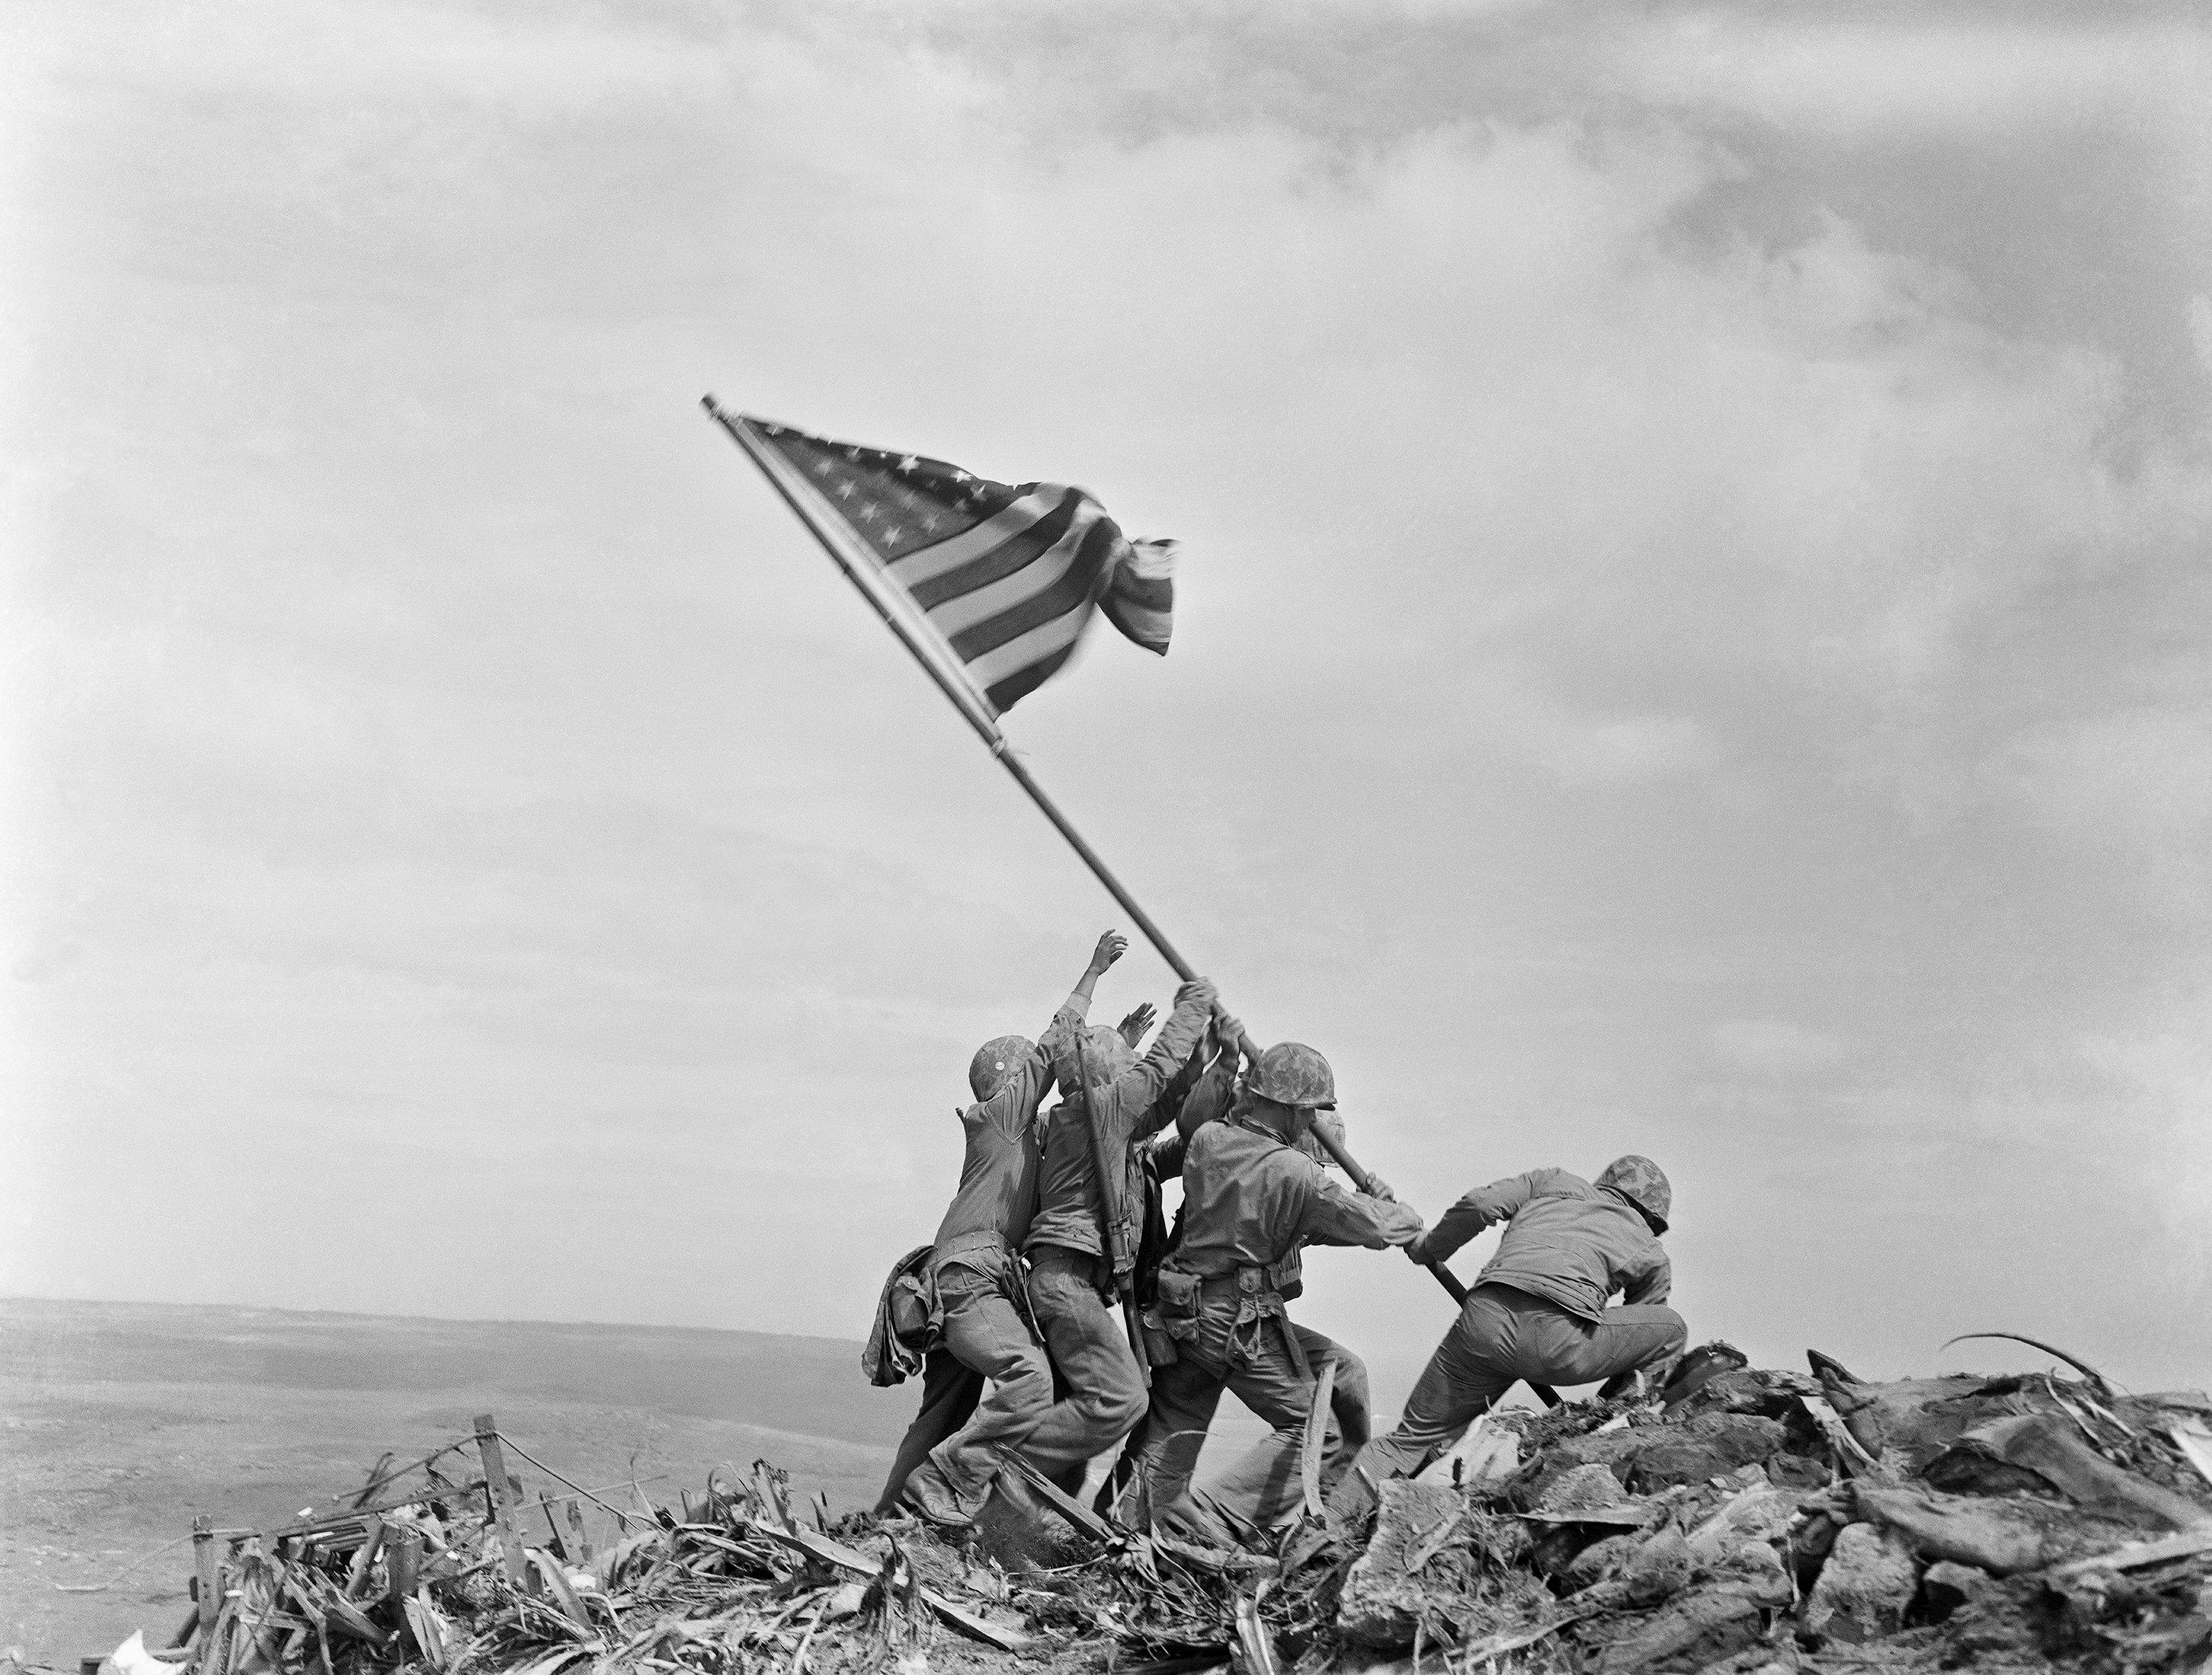 Raising the Flag on Iwo Jima, by Joe Rosenthal